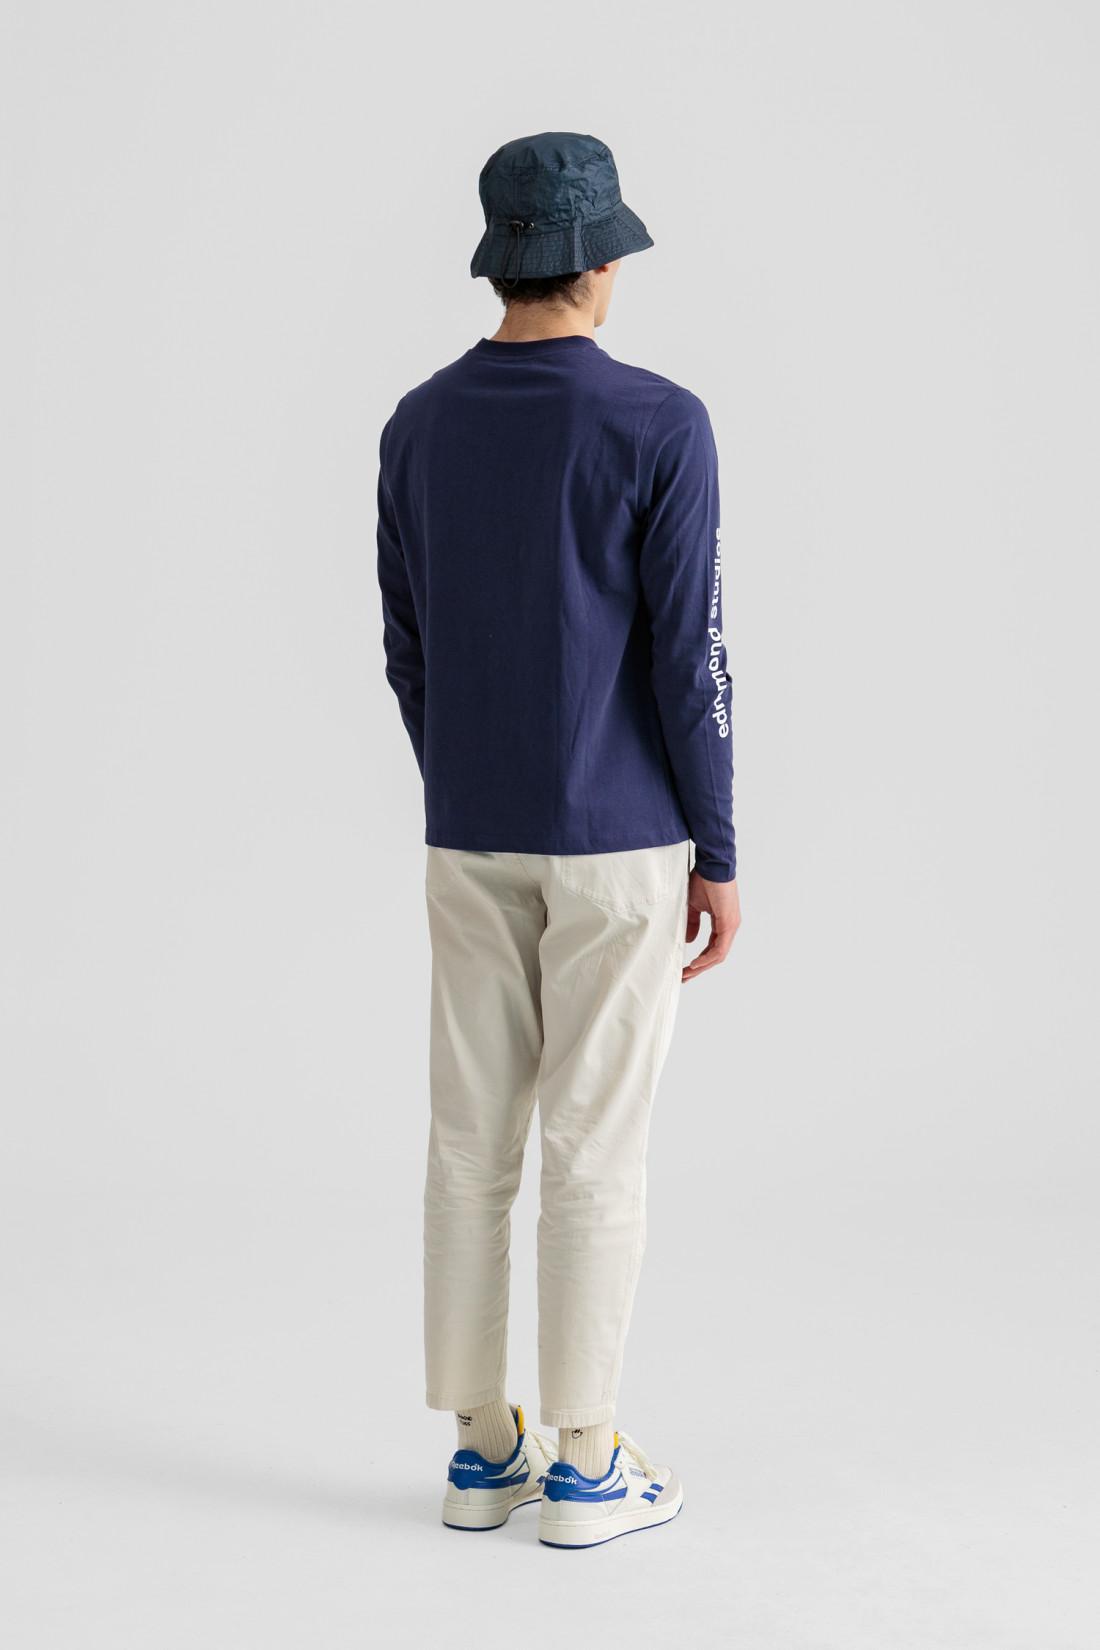 Camiseta manga larga, cuello redondo y tipografia Edmmond